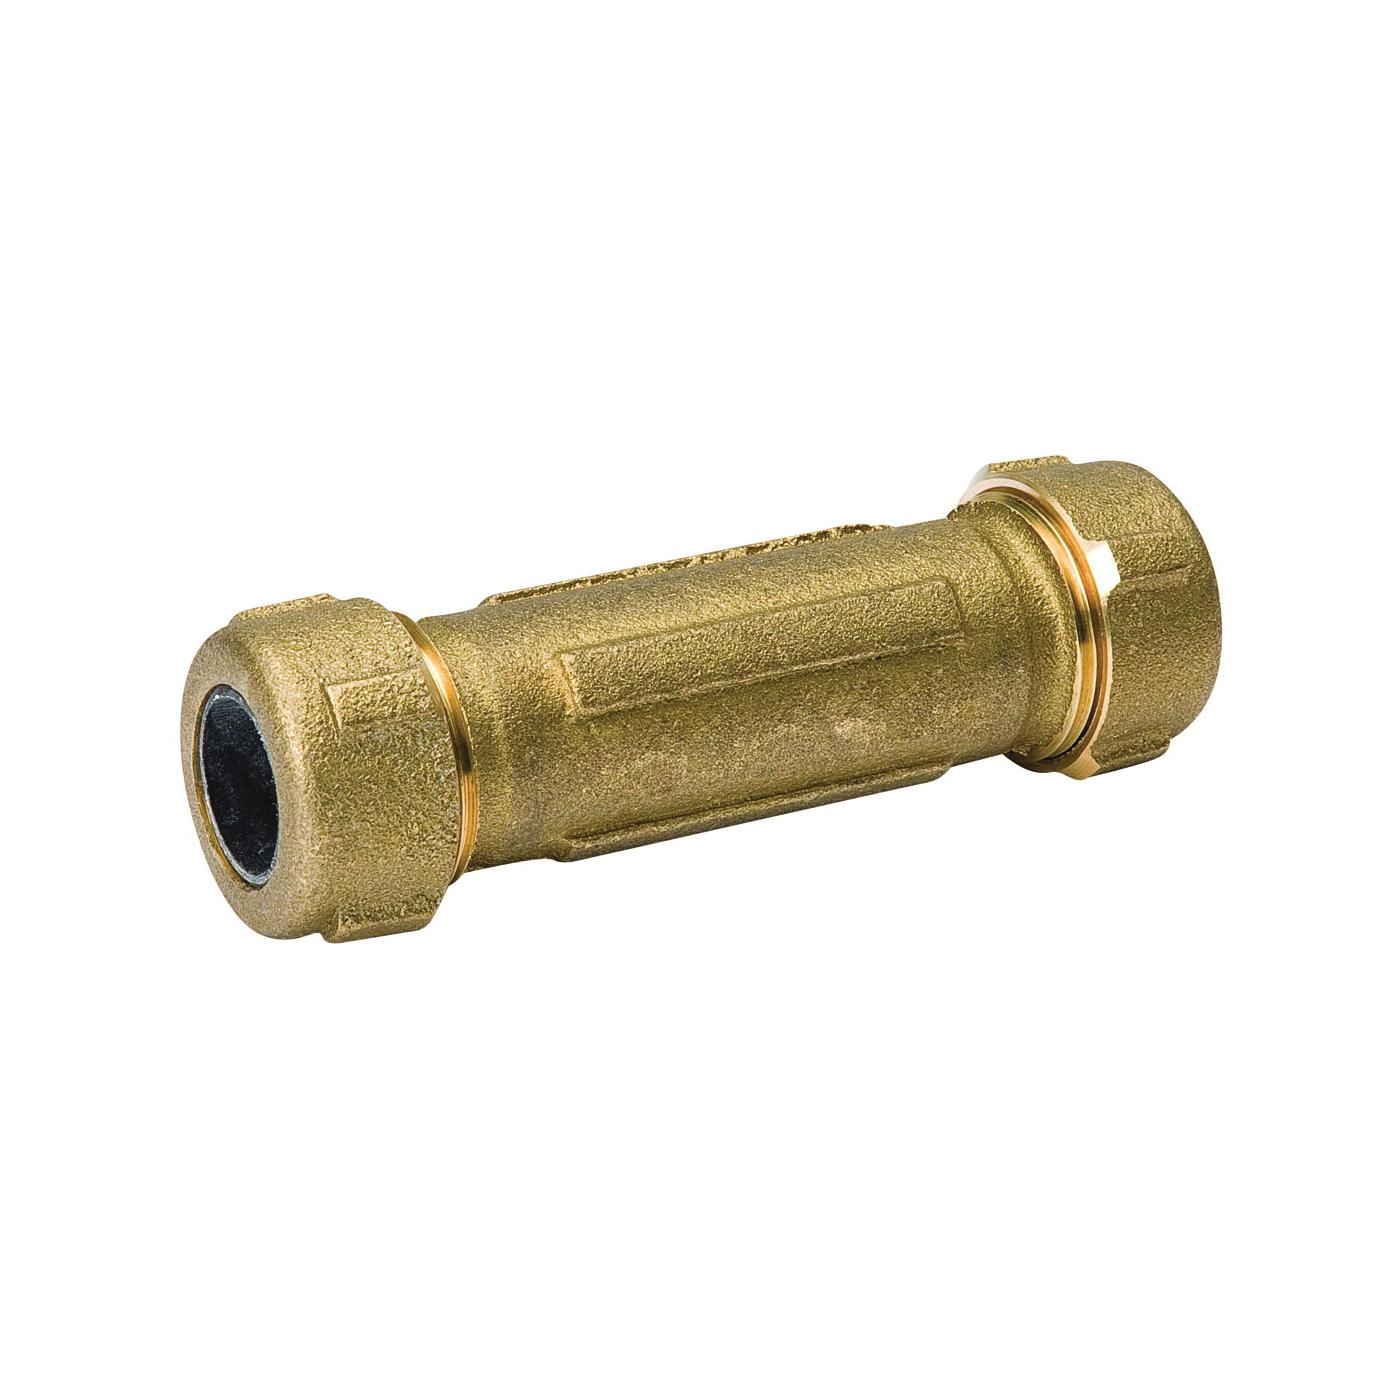 Picture of B & K 160-304NL Compression Coupler, 3/4 in, Brass, 125 psi Pressure